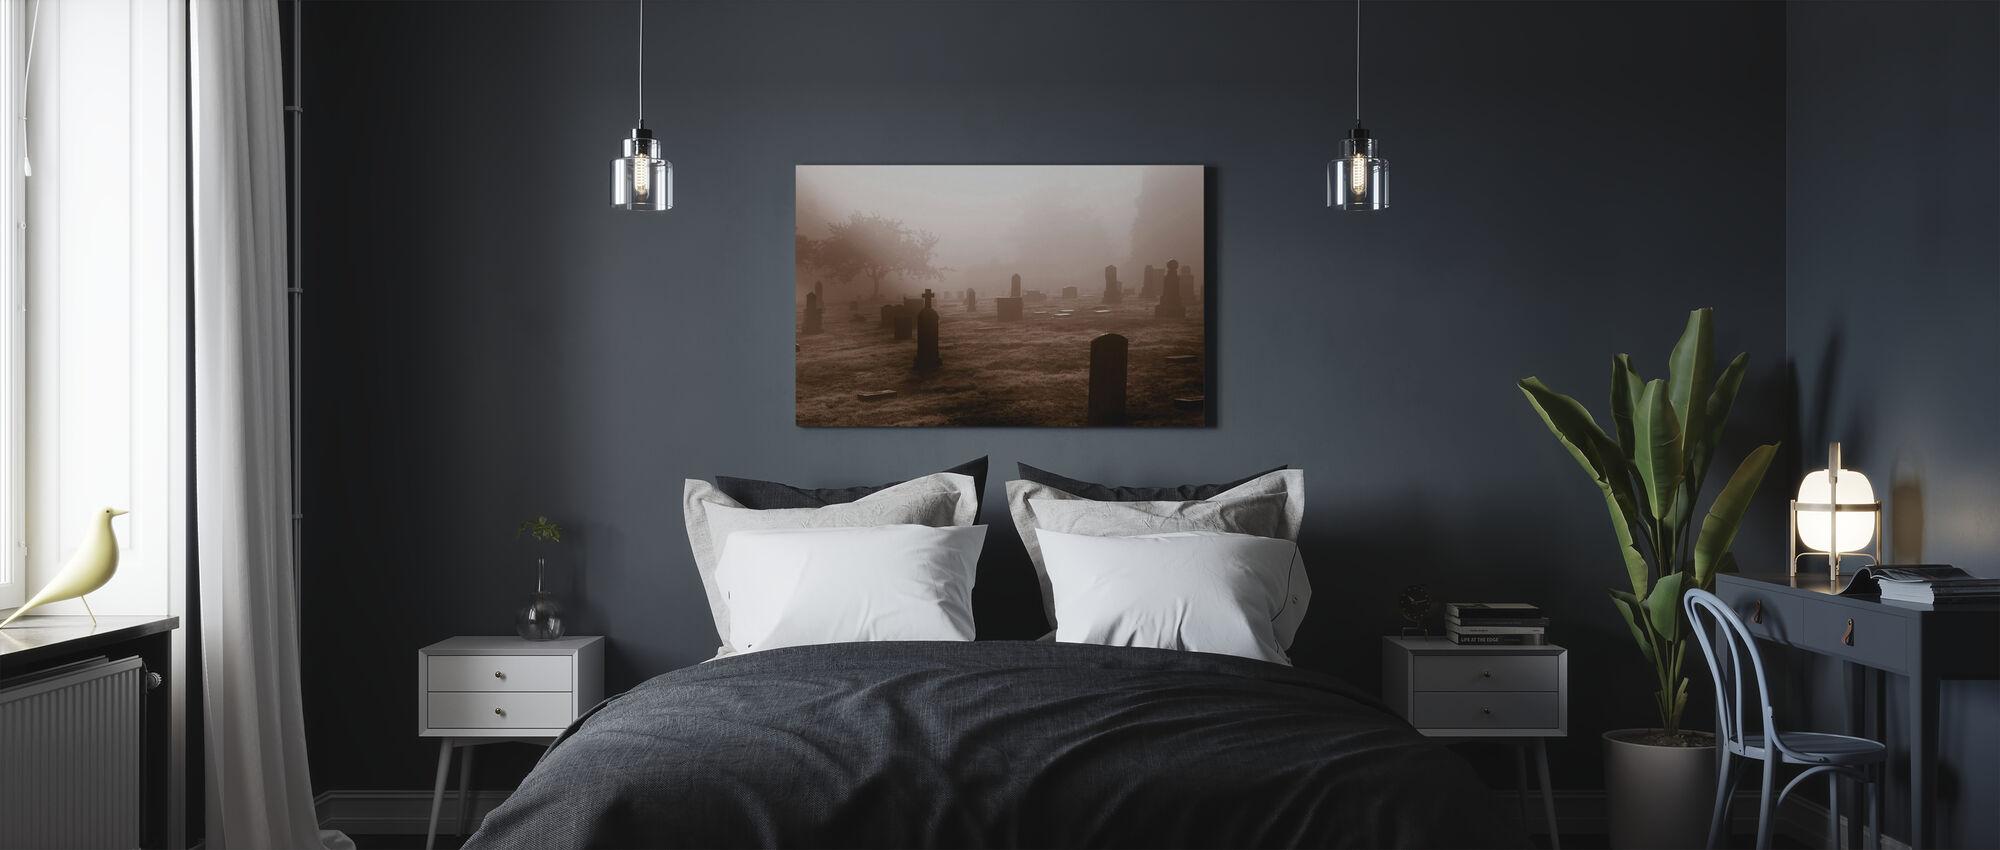 Graveyard in October - Canvas print - Bedroom